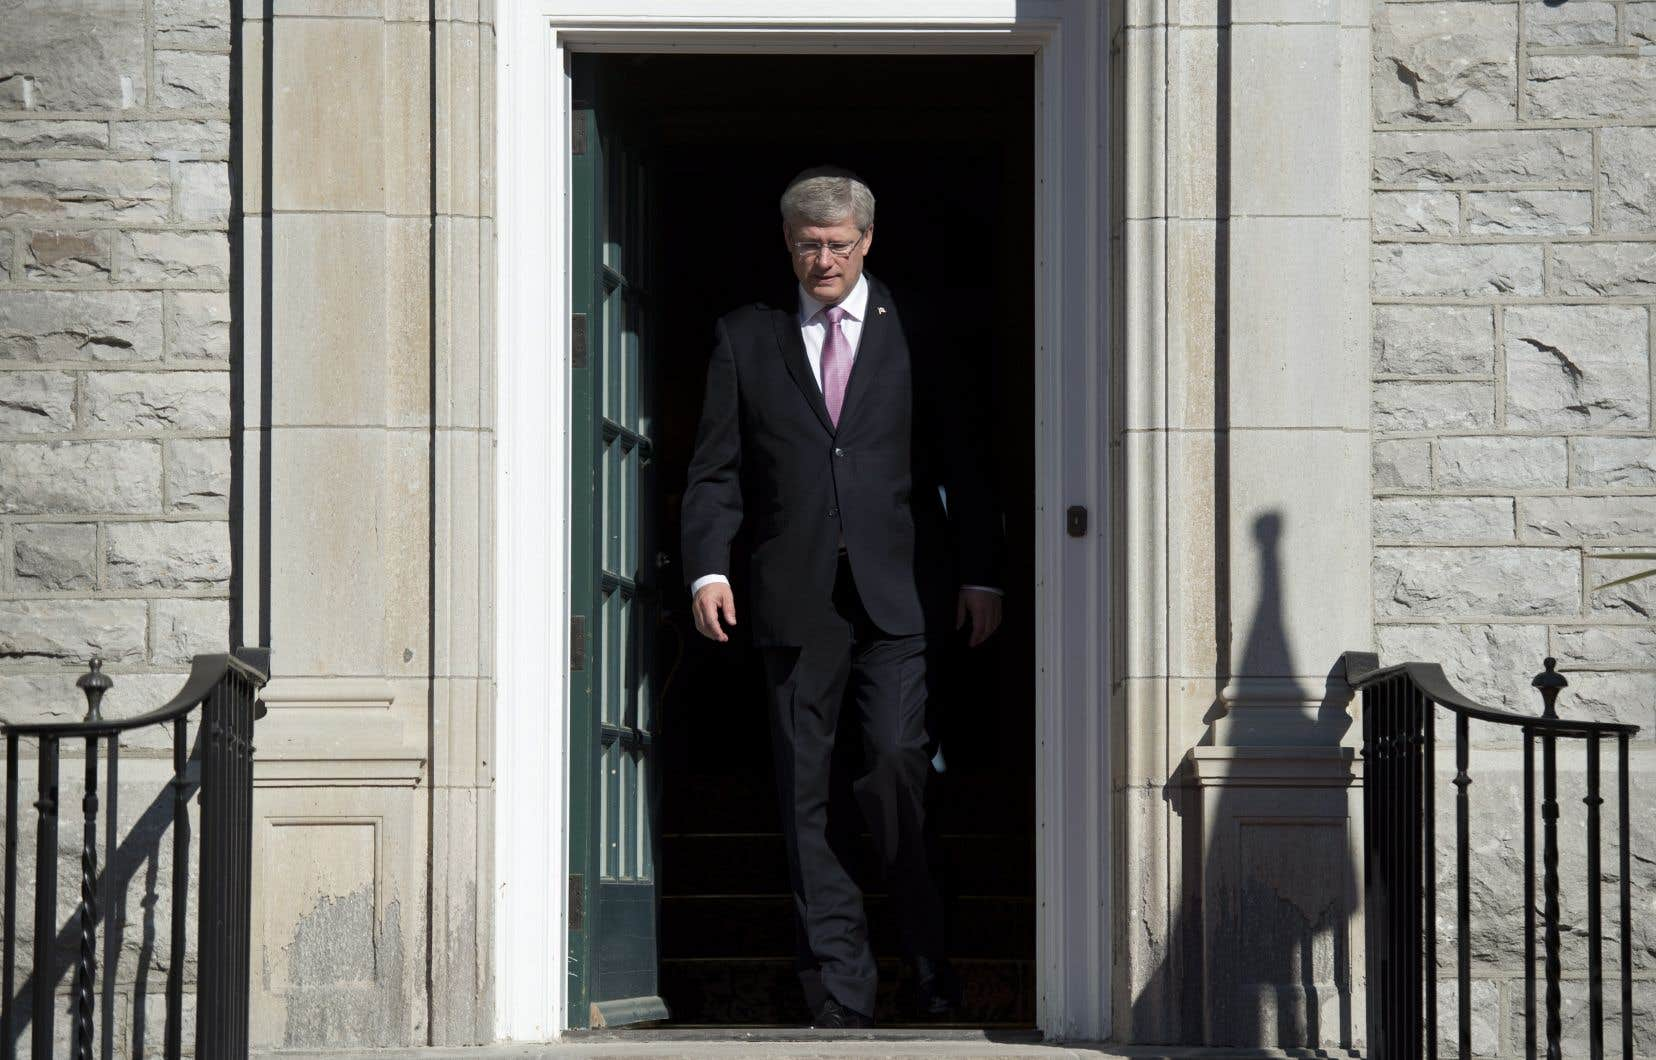 L'ex-premier ministre canadien Stephen Harper